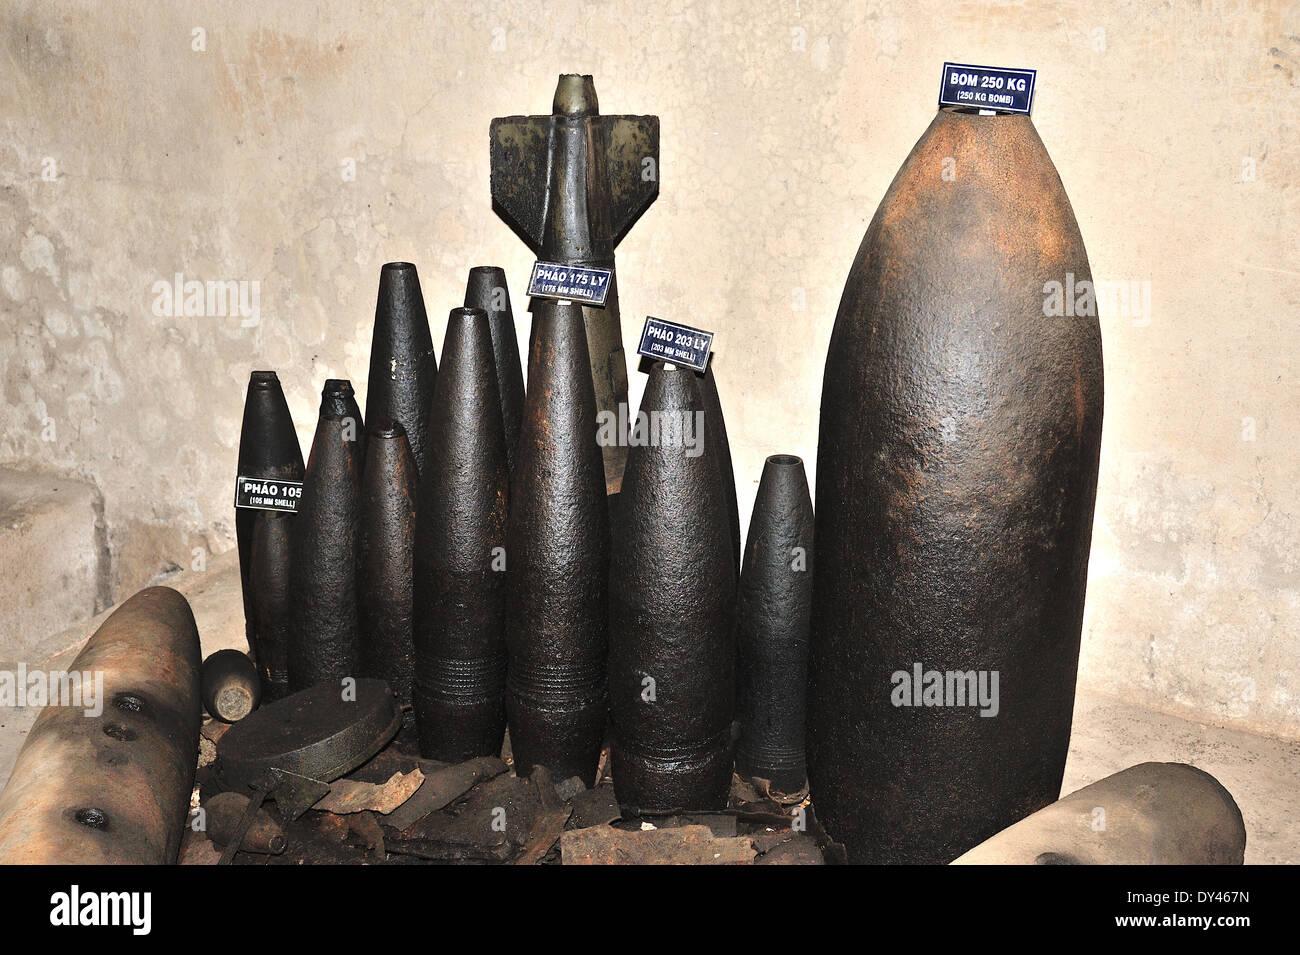 Bombs left over from Vietnam War - Stock Image